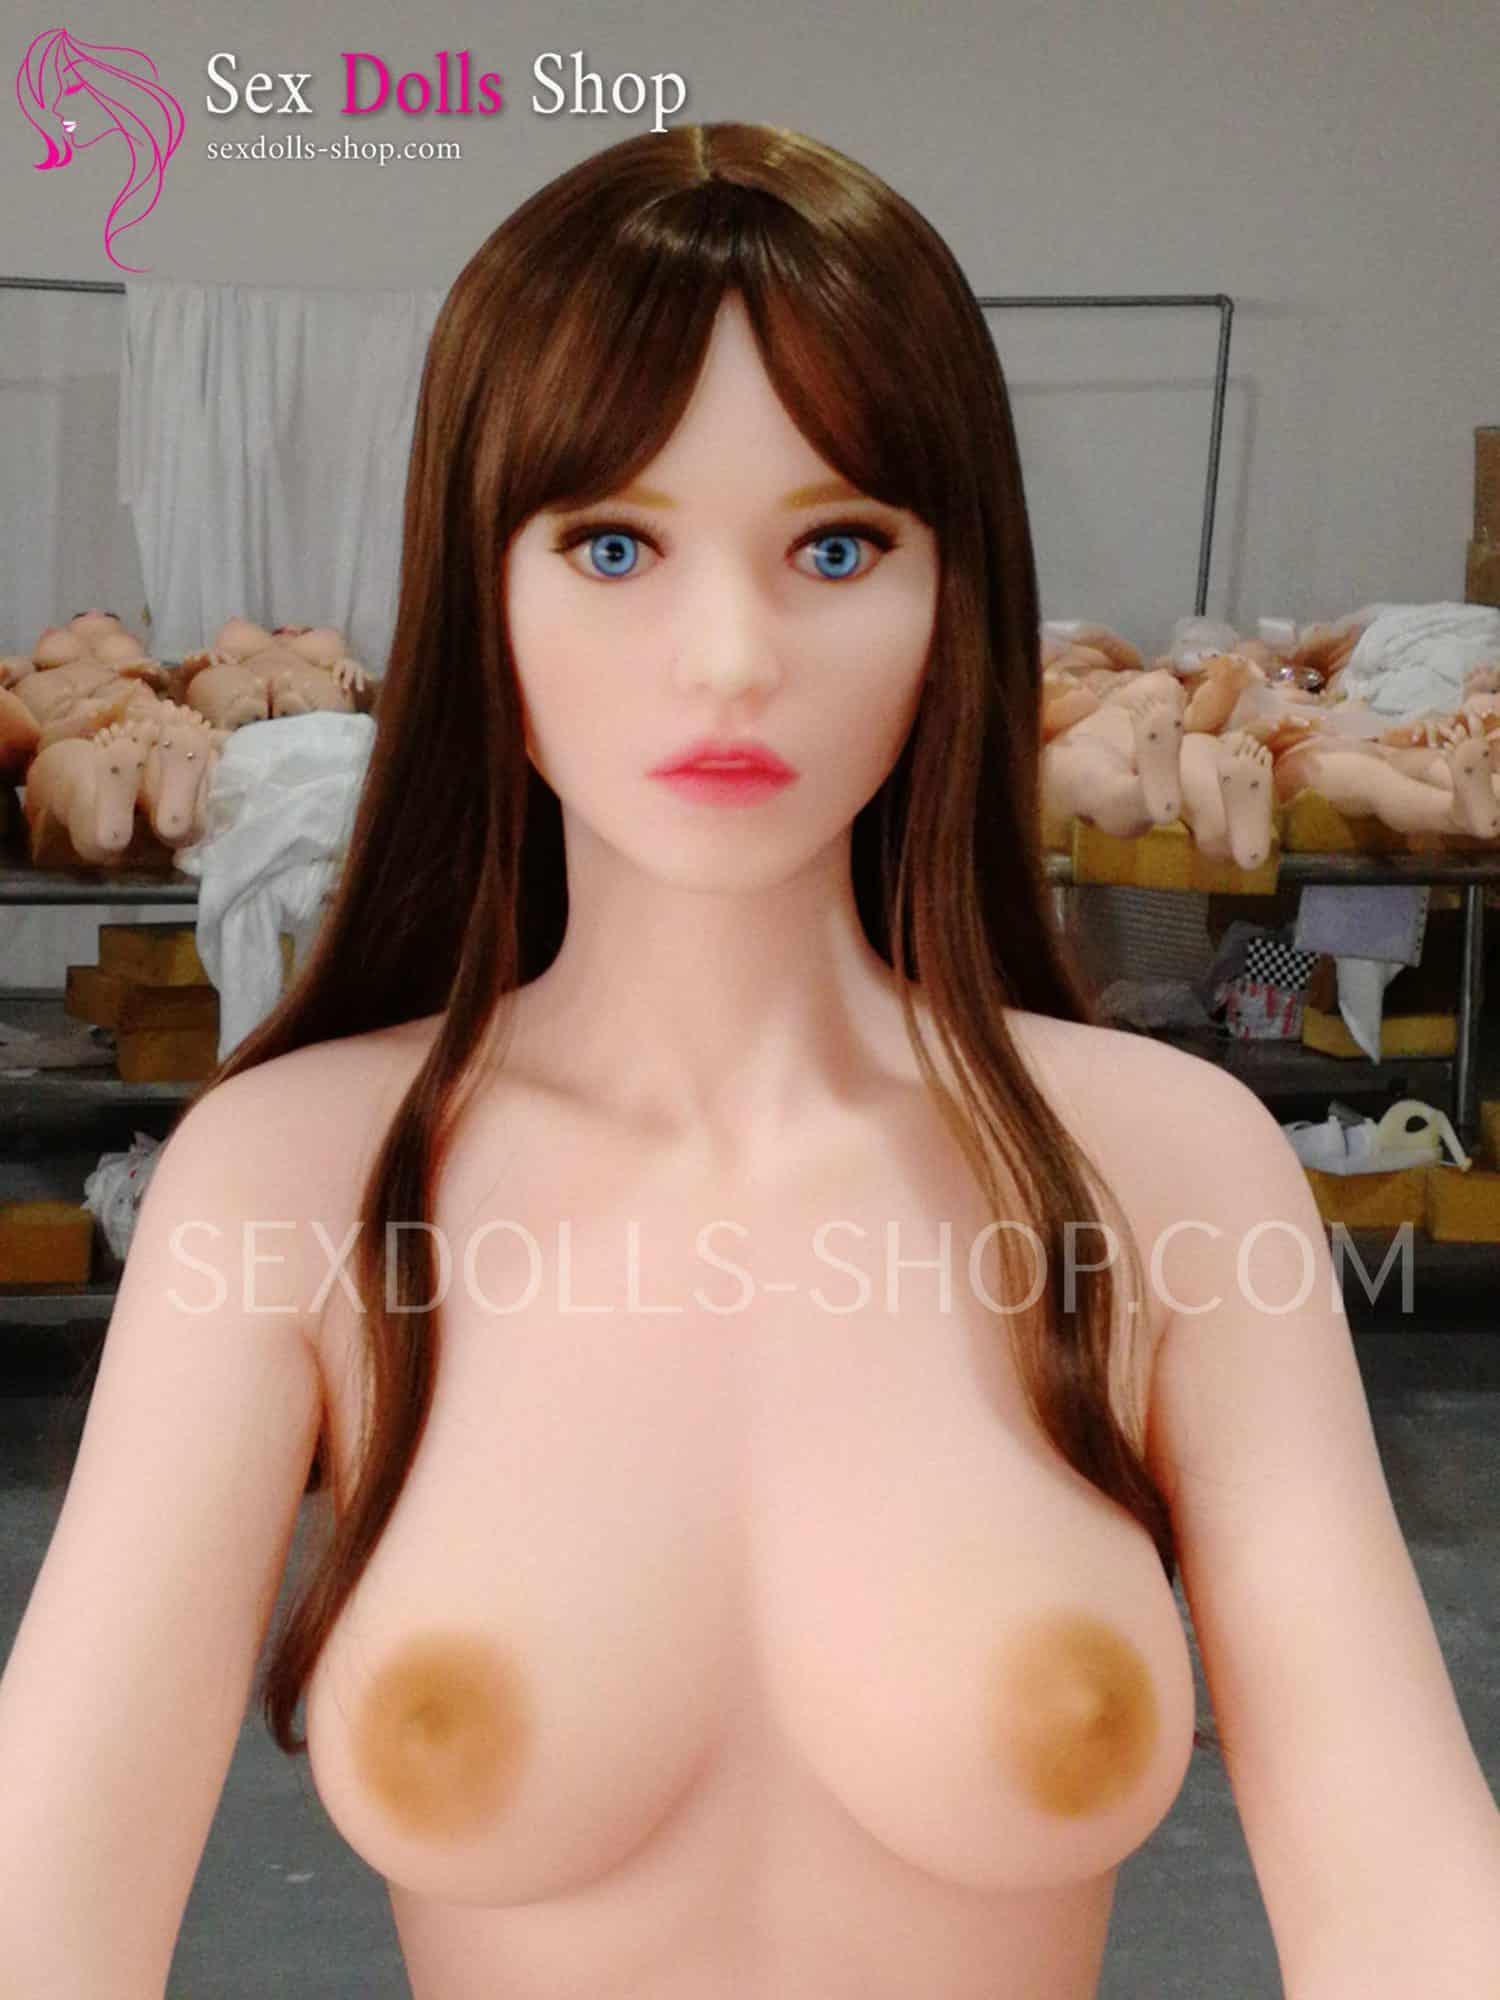 Piperdoll Jenna 162cm C cup pink white skin light brown nipples